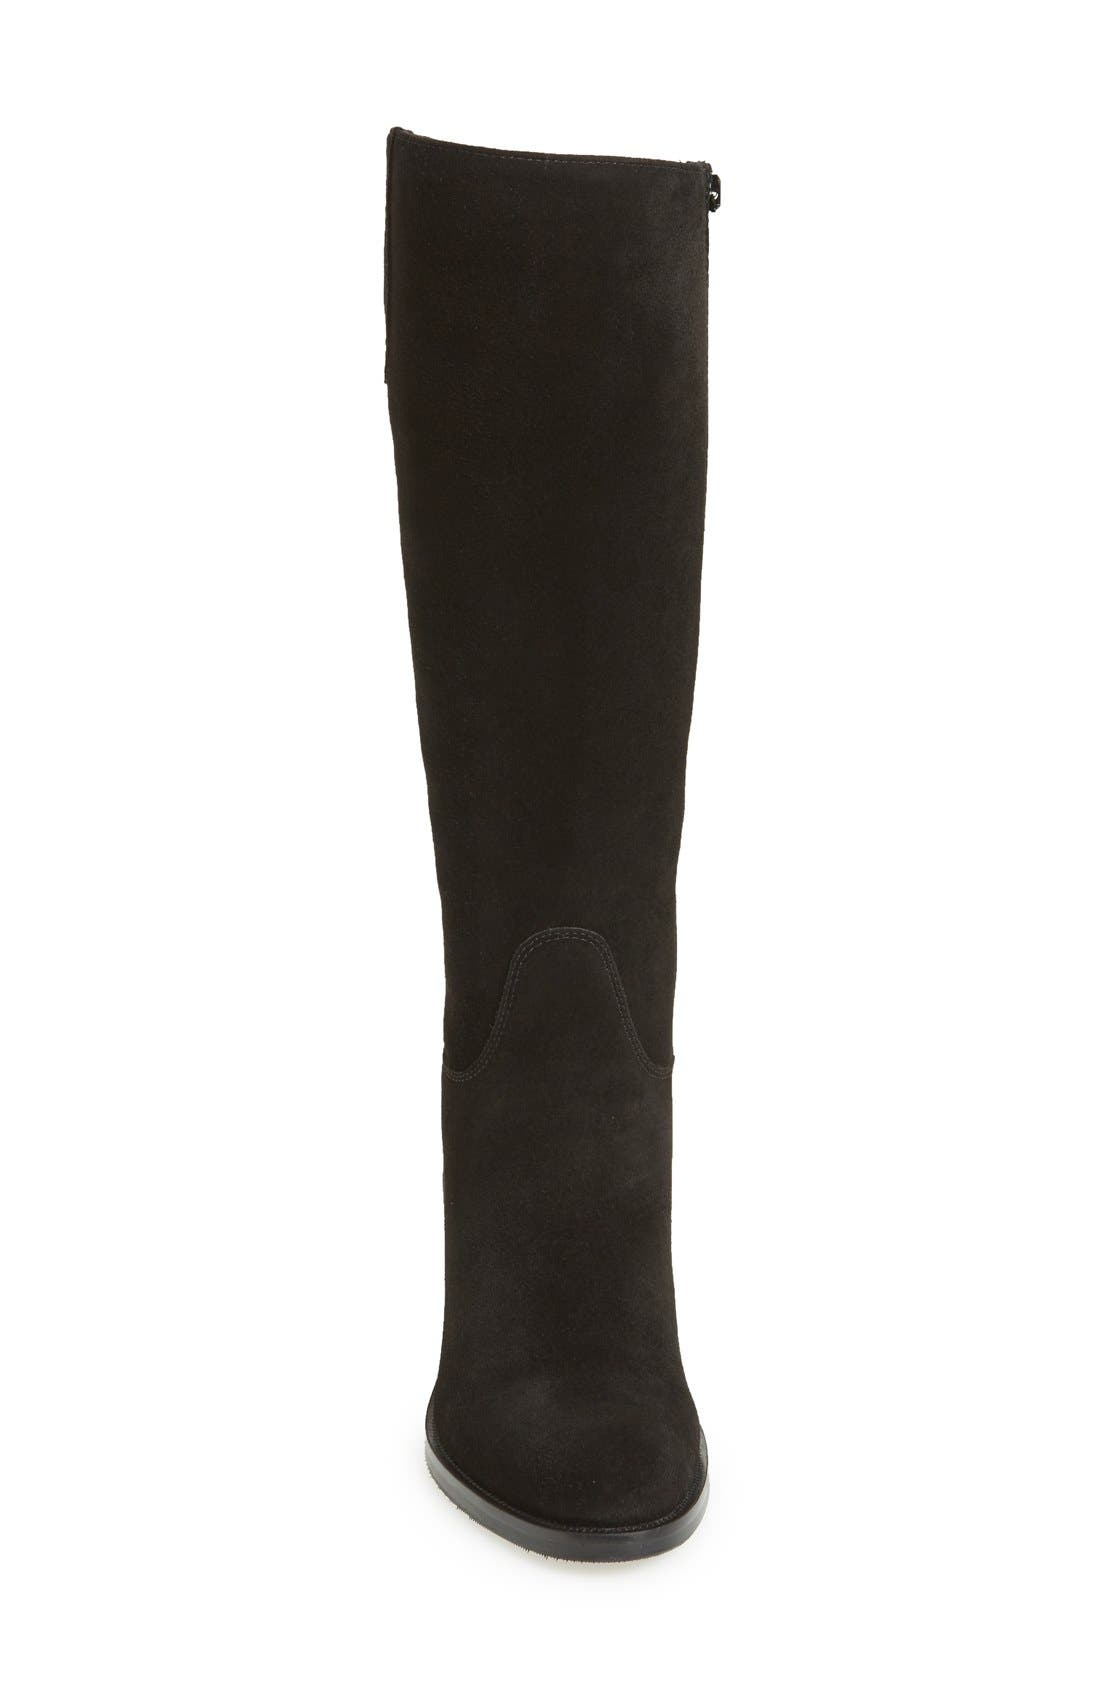 LA CANADIENNE, 'Polly' Waterproof Knee High Boot, Alternate thumbnail 3, color, BLACK SUEDE